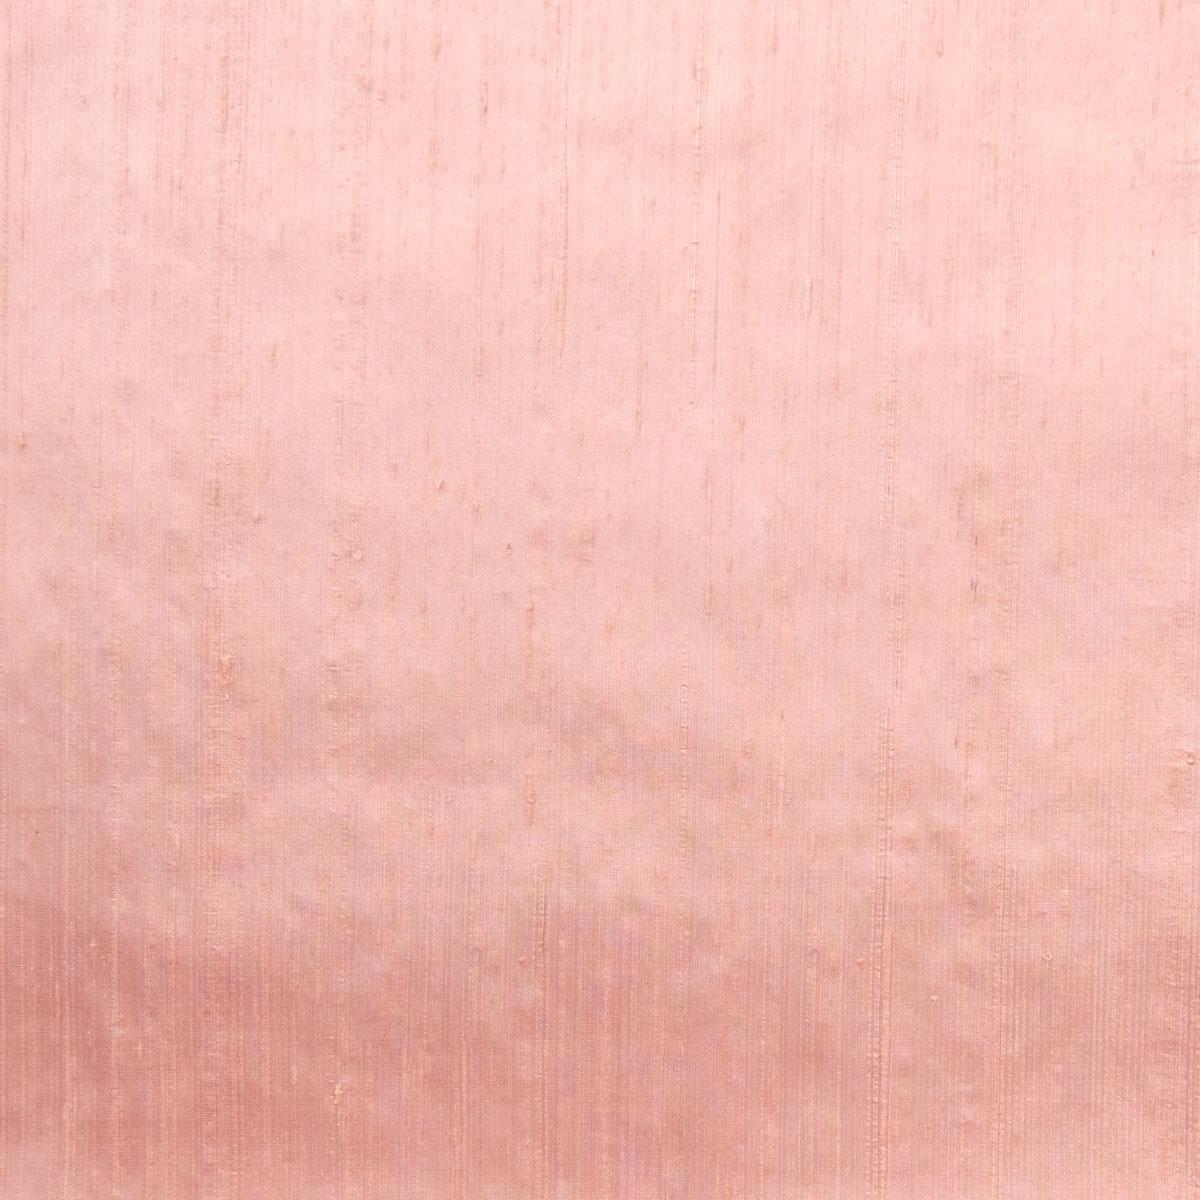 25. Pale Rosa Jedwab +85PLN